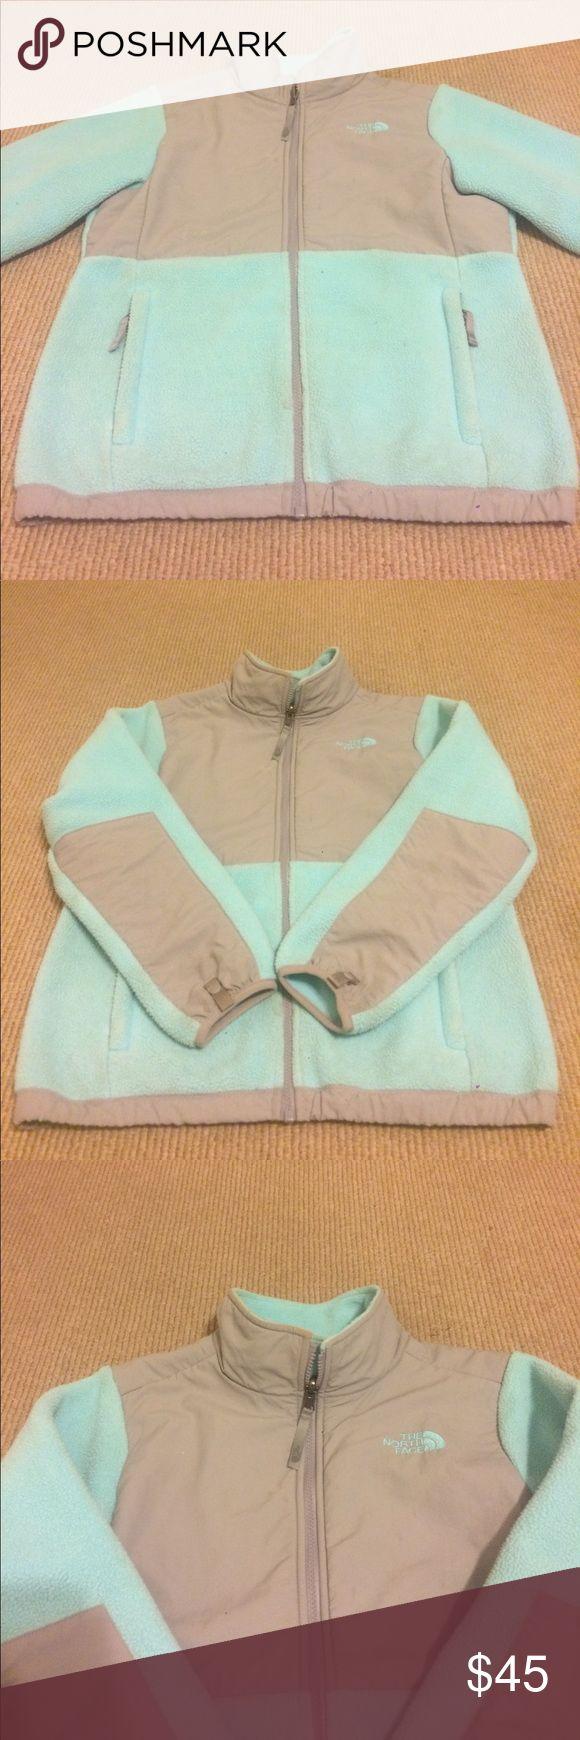 North Face small Denali jacket Small women's North Face jacket. North Face Jackets & Coats